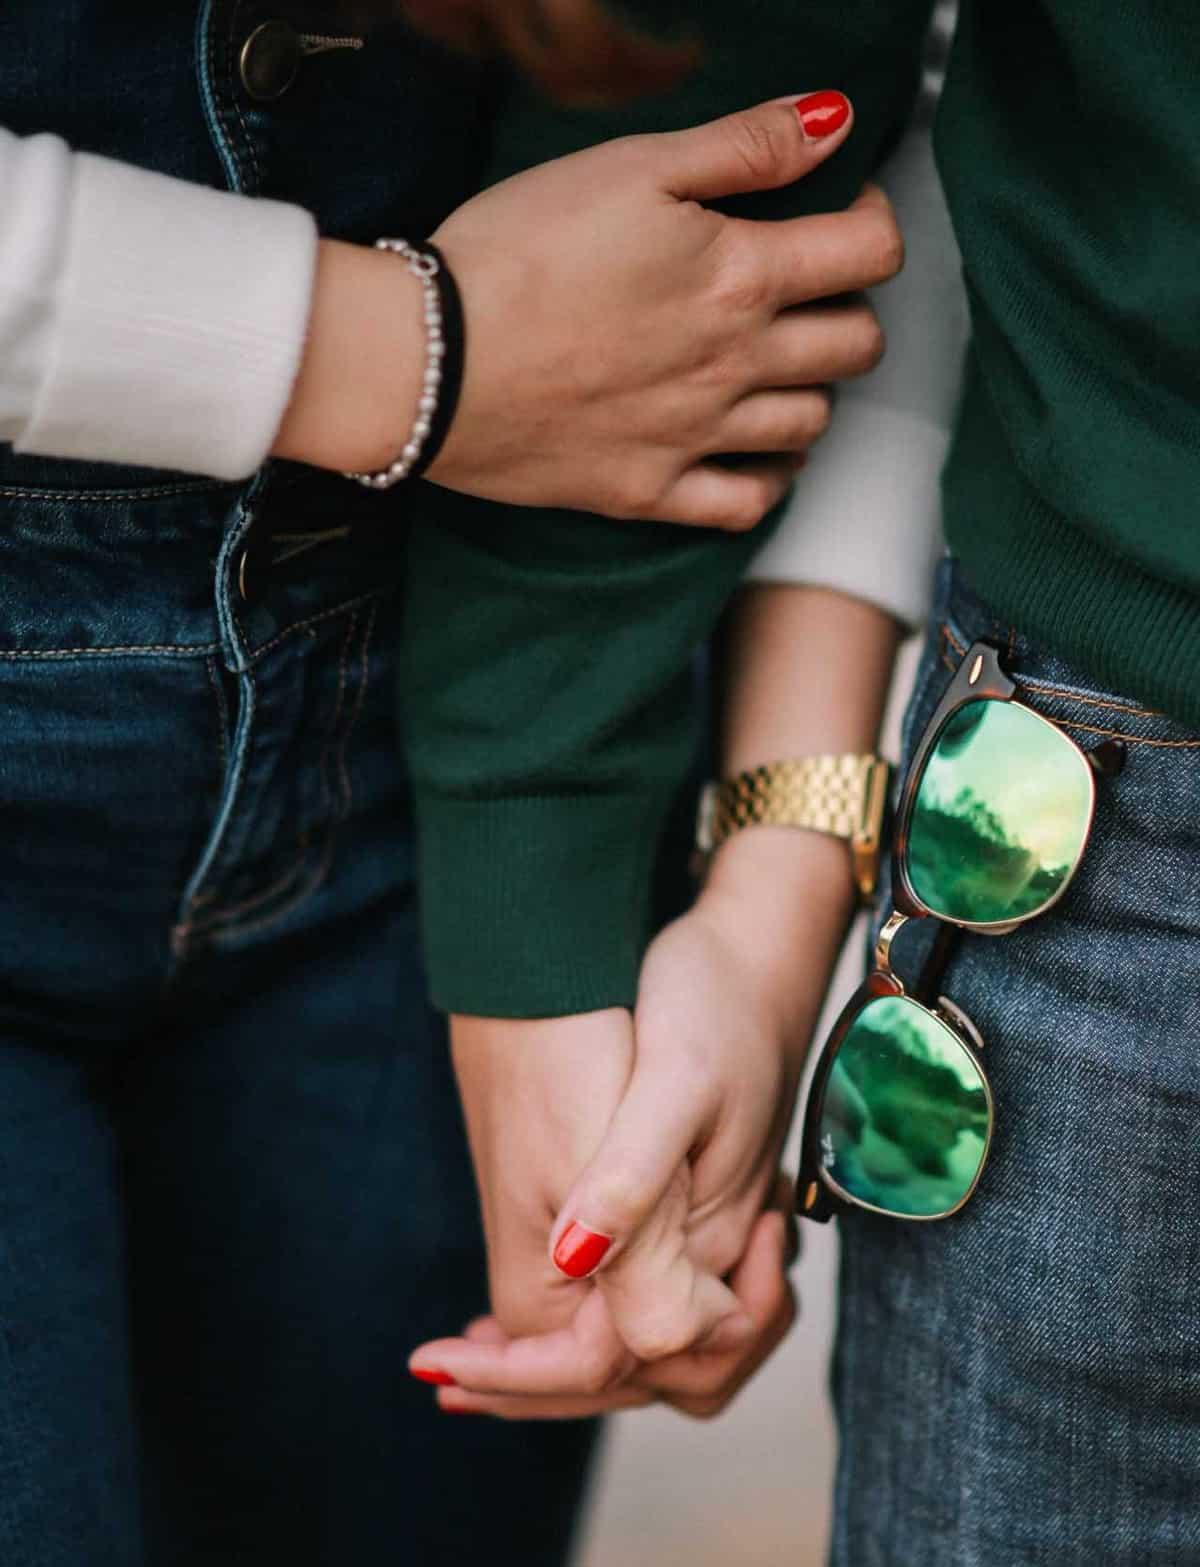 How to meet your girlfriend